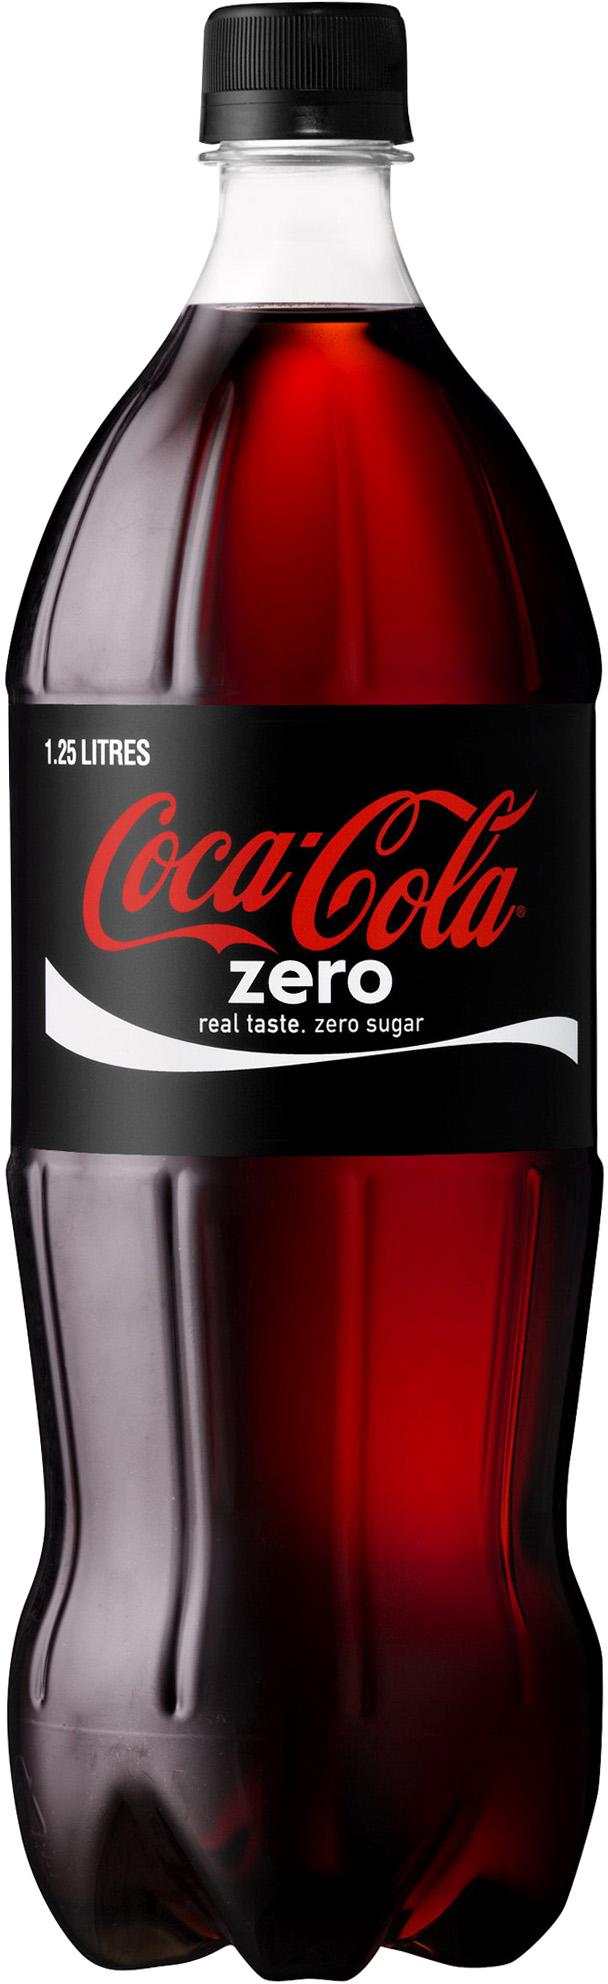 Coca Cola bottle PNG image download free.